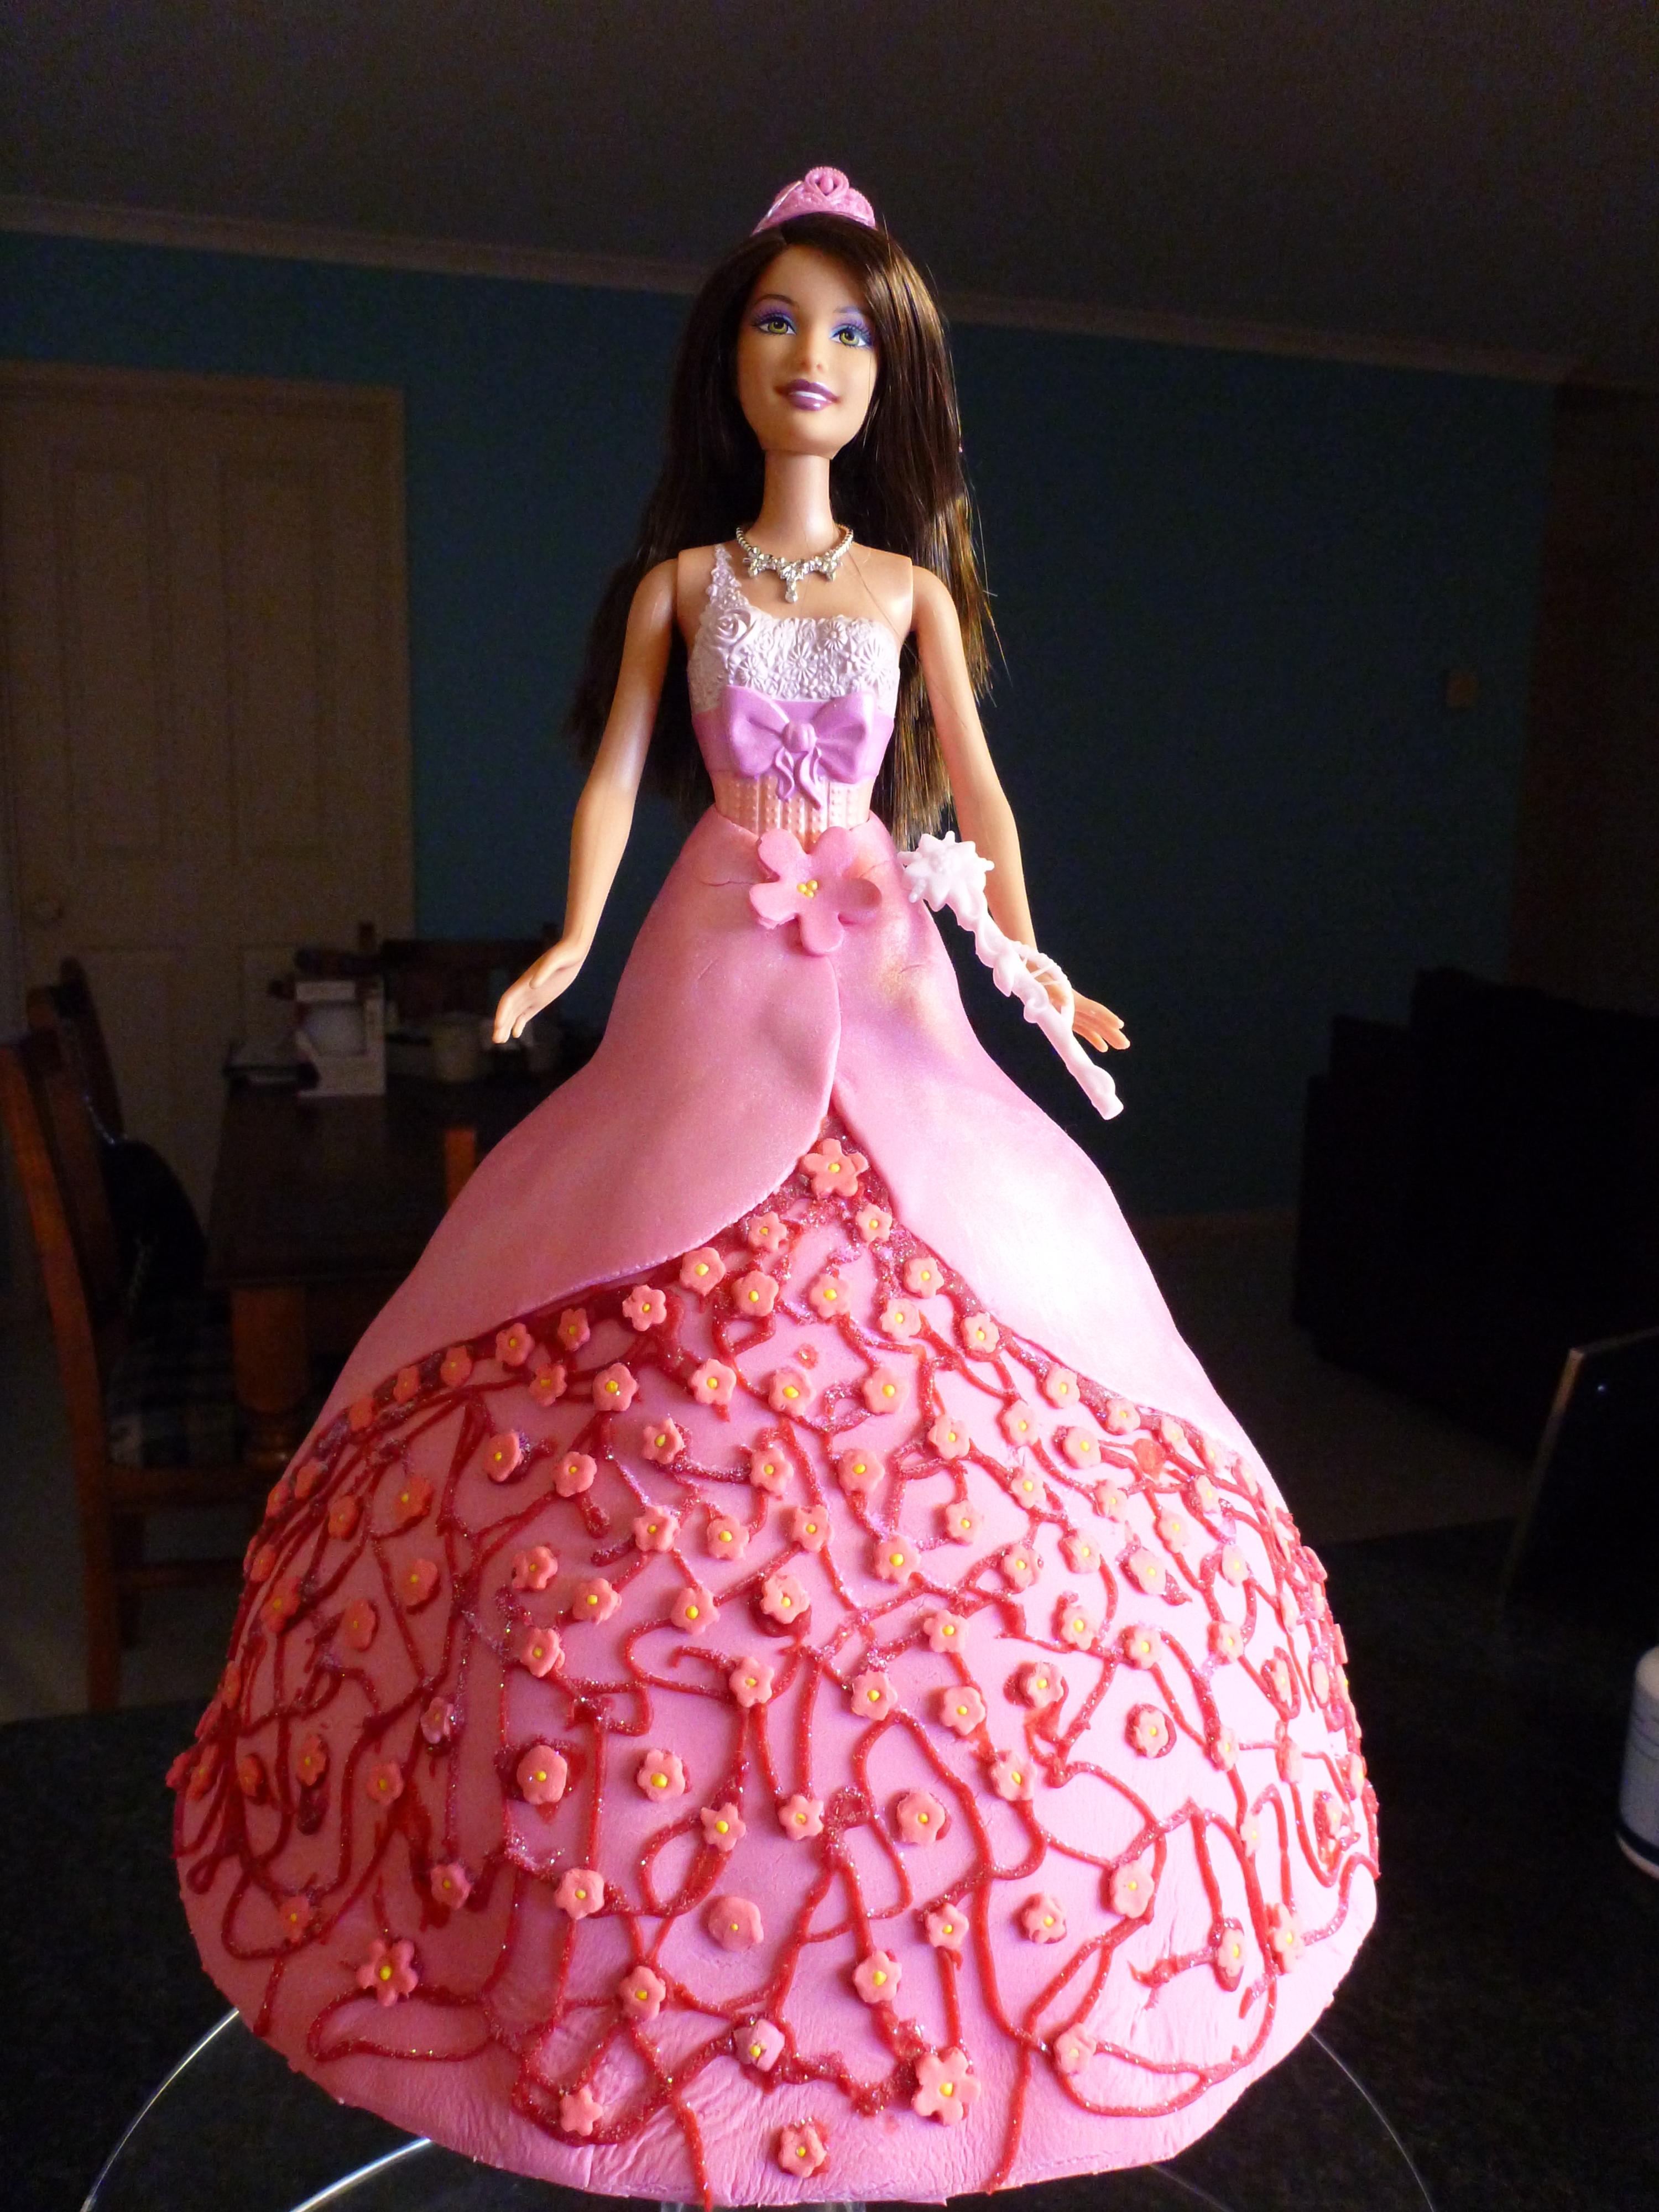 Barbie Princess Doll Cake Girls Birthday Cake CakeCentralcom - Birthday cake doll princess